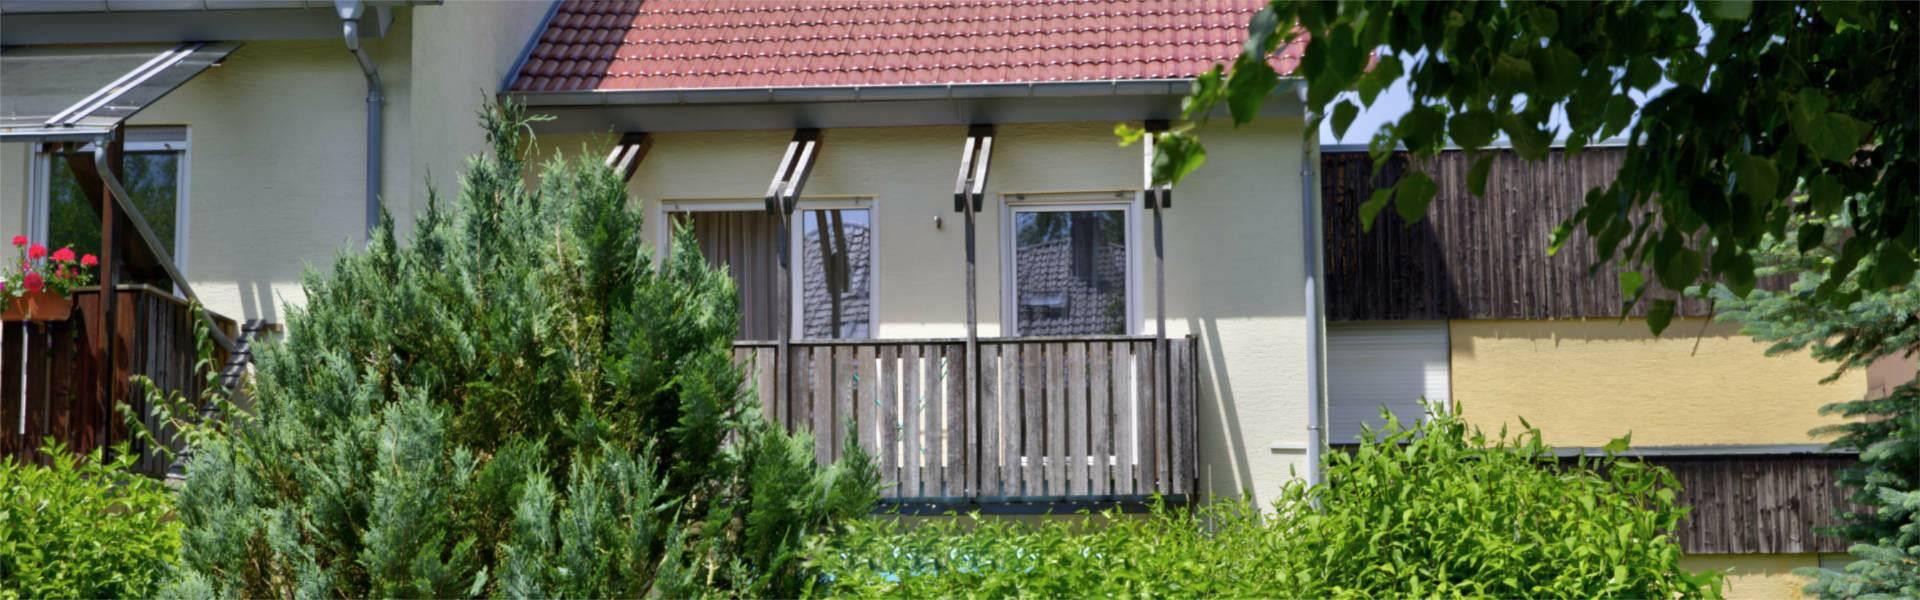 Puchheim Haus